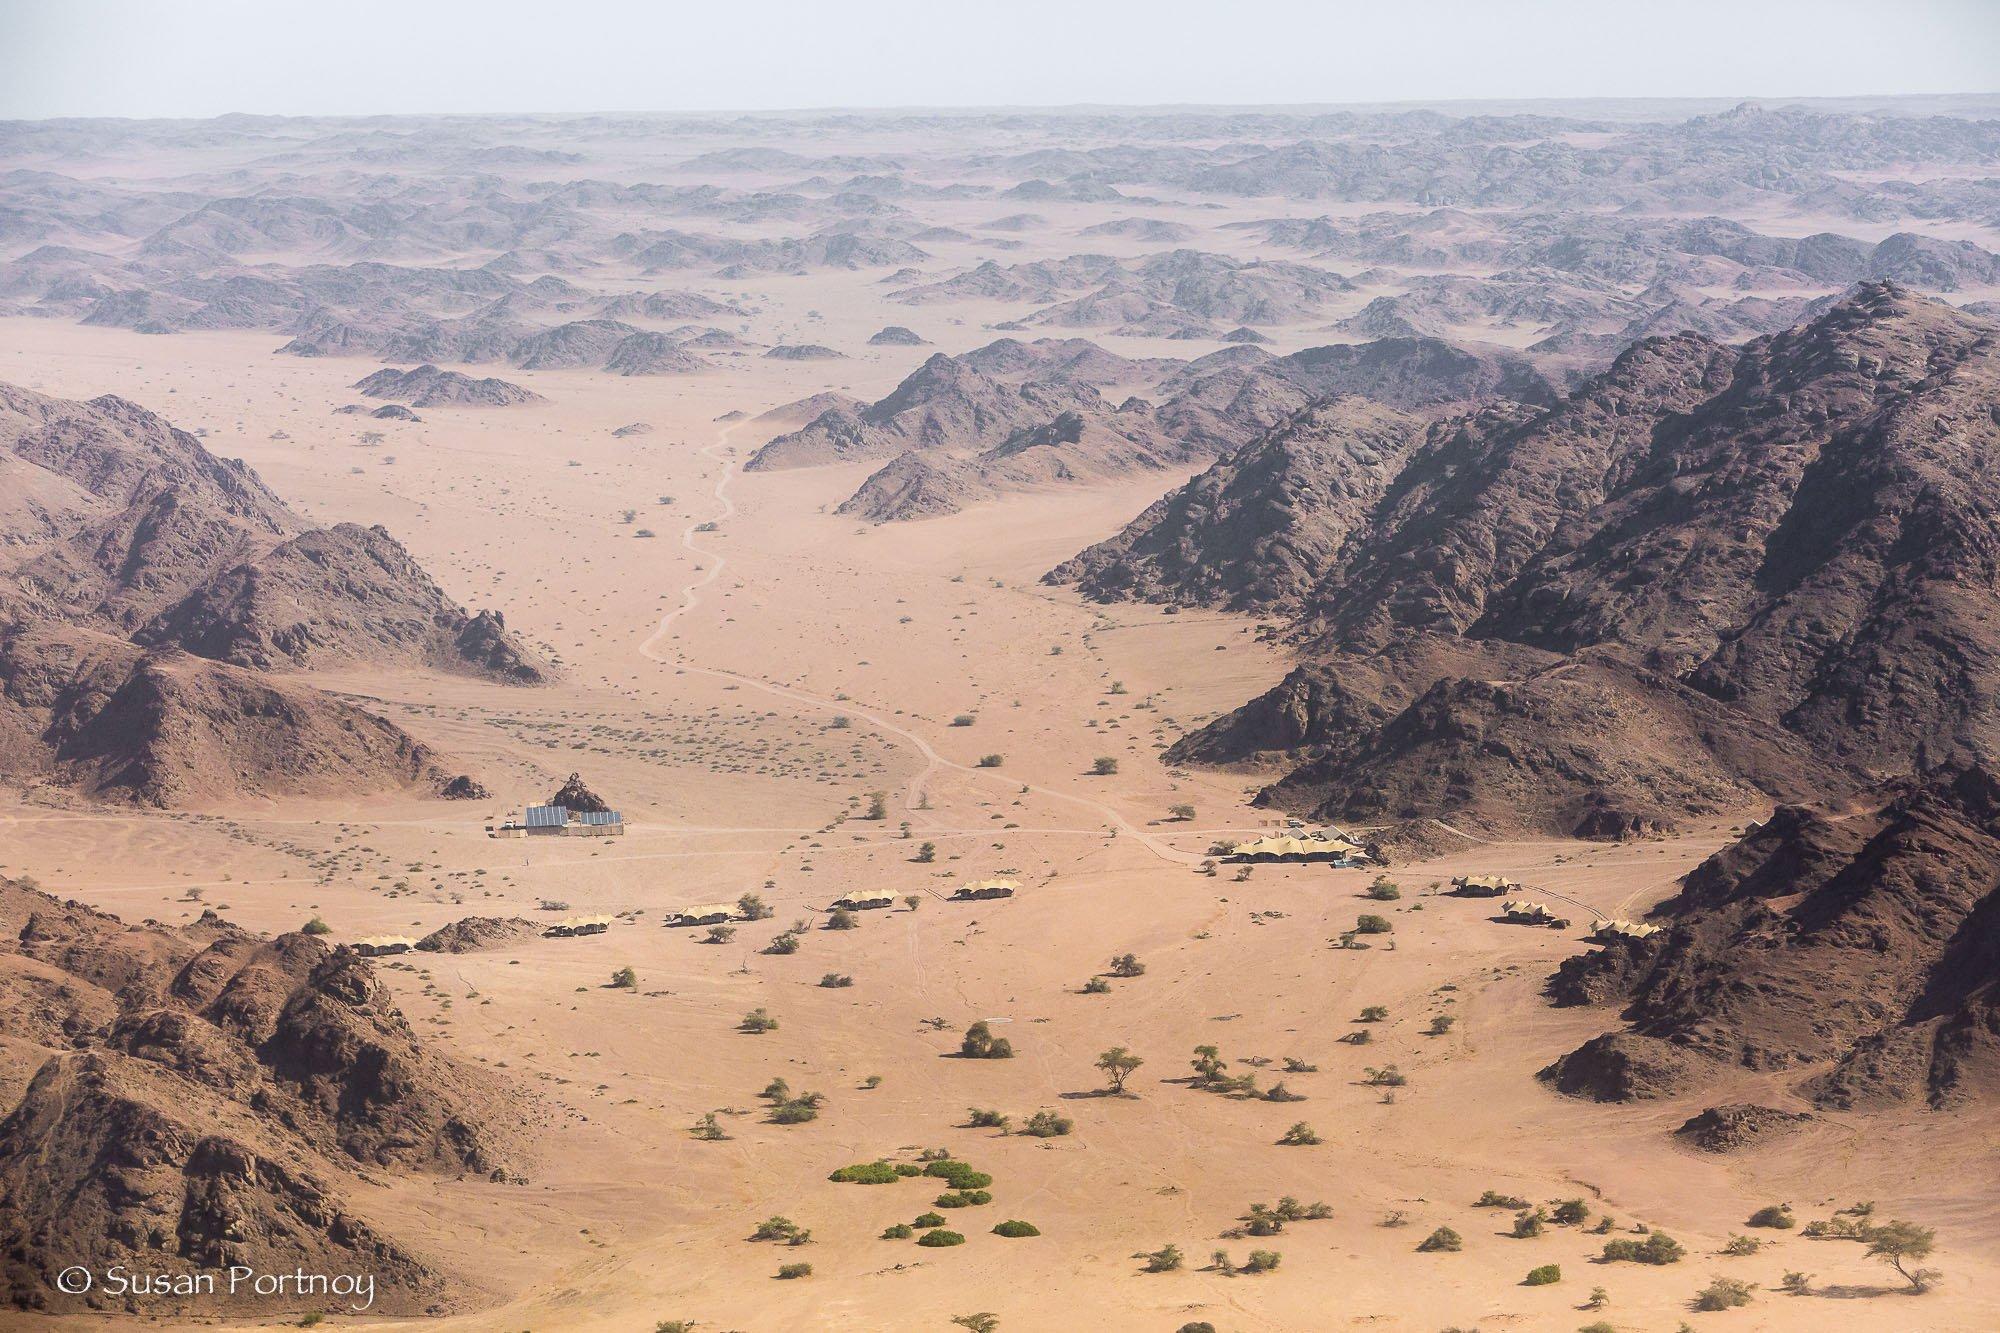 Aerial view of Hoanib Skeleton Coast Camp, Namibia